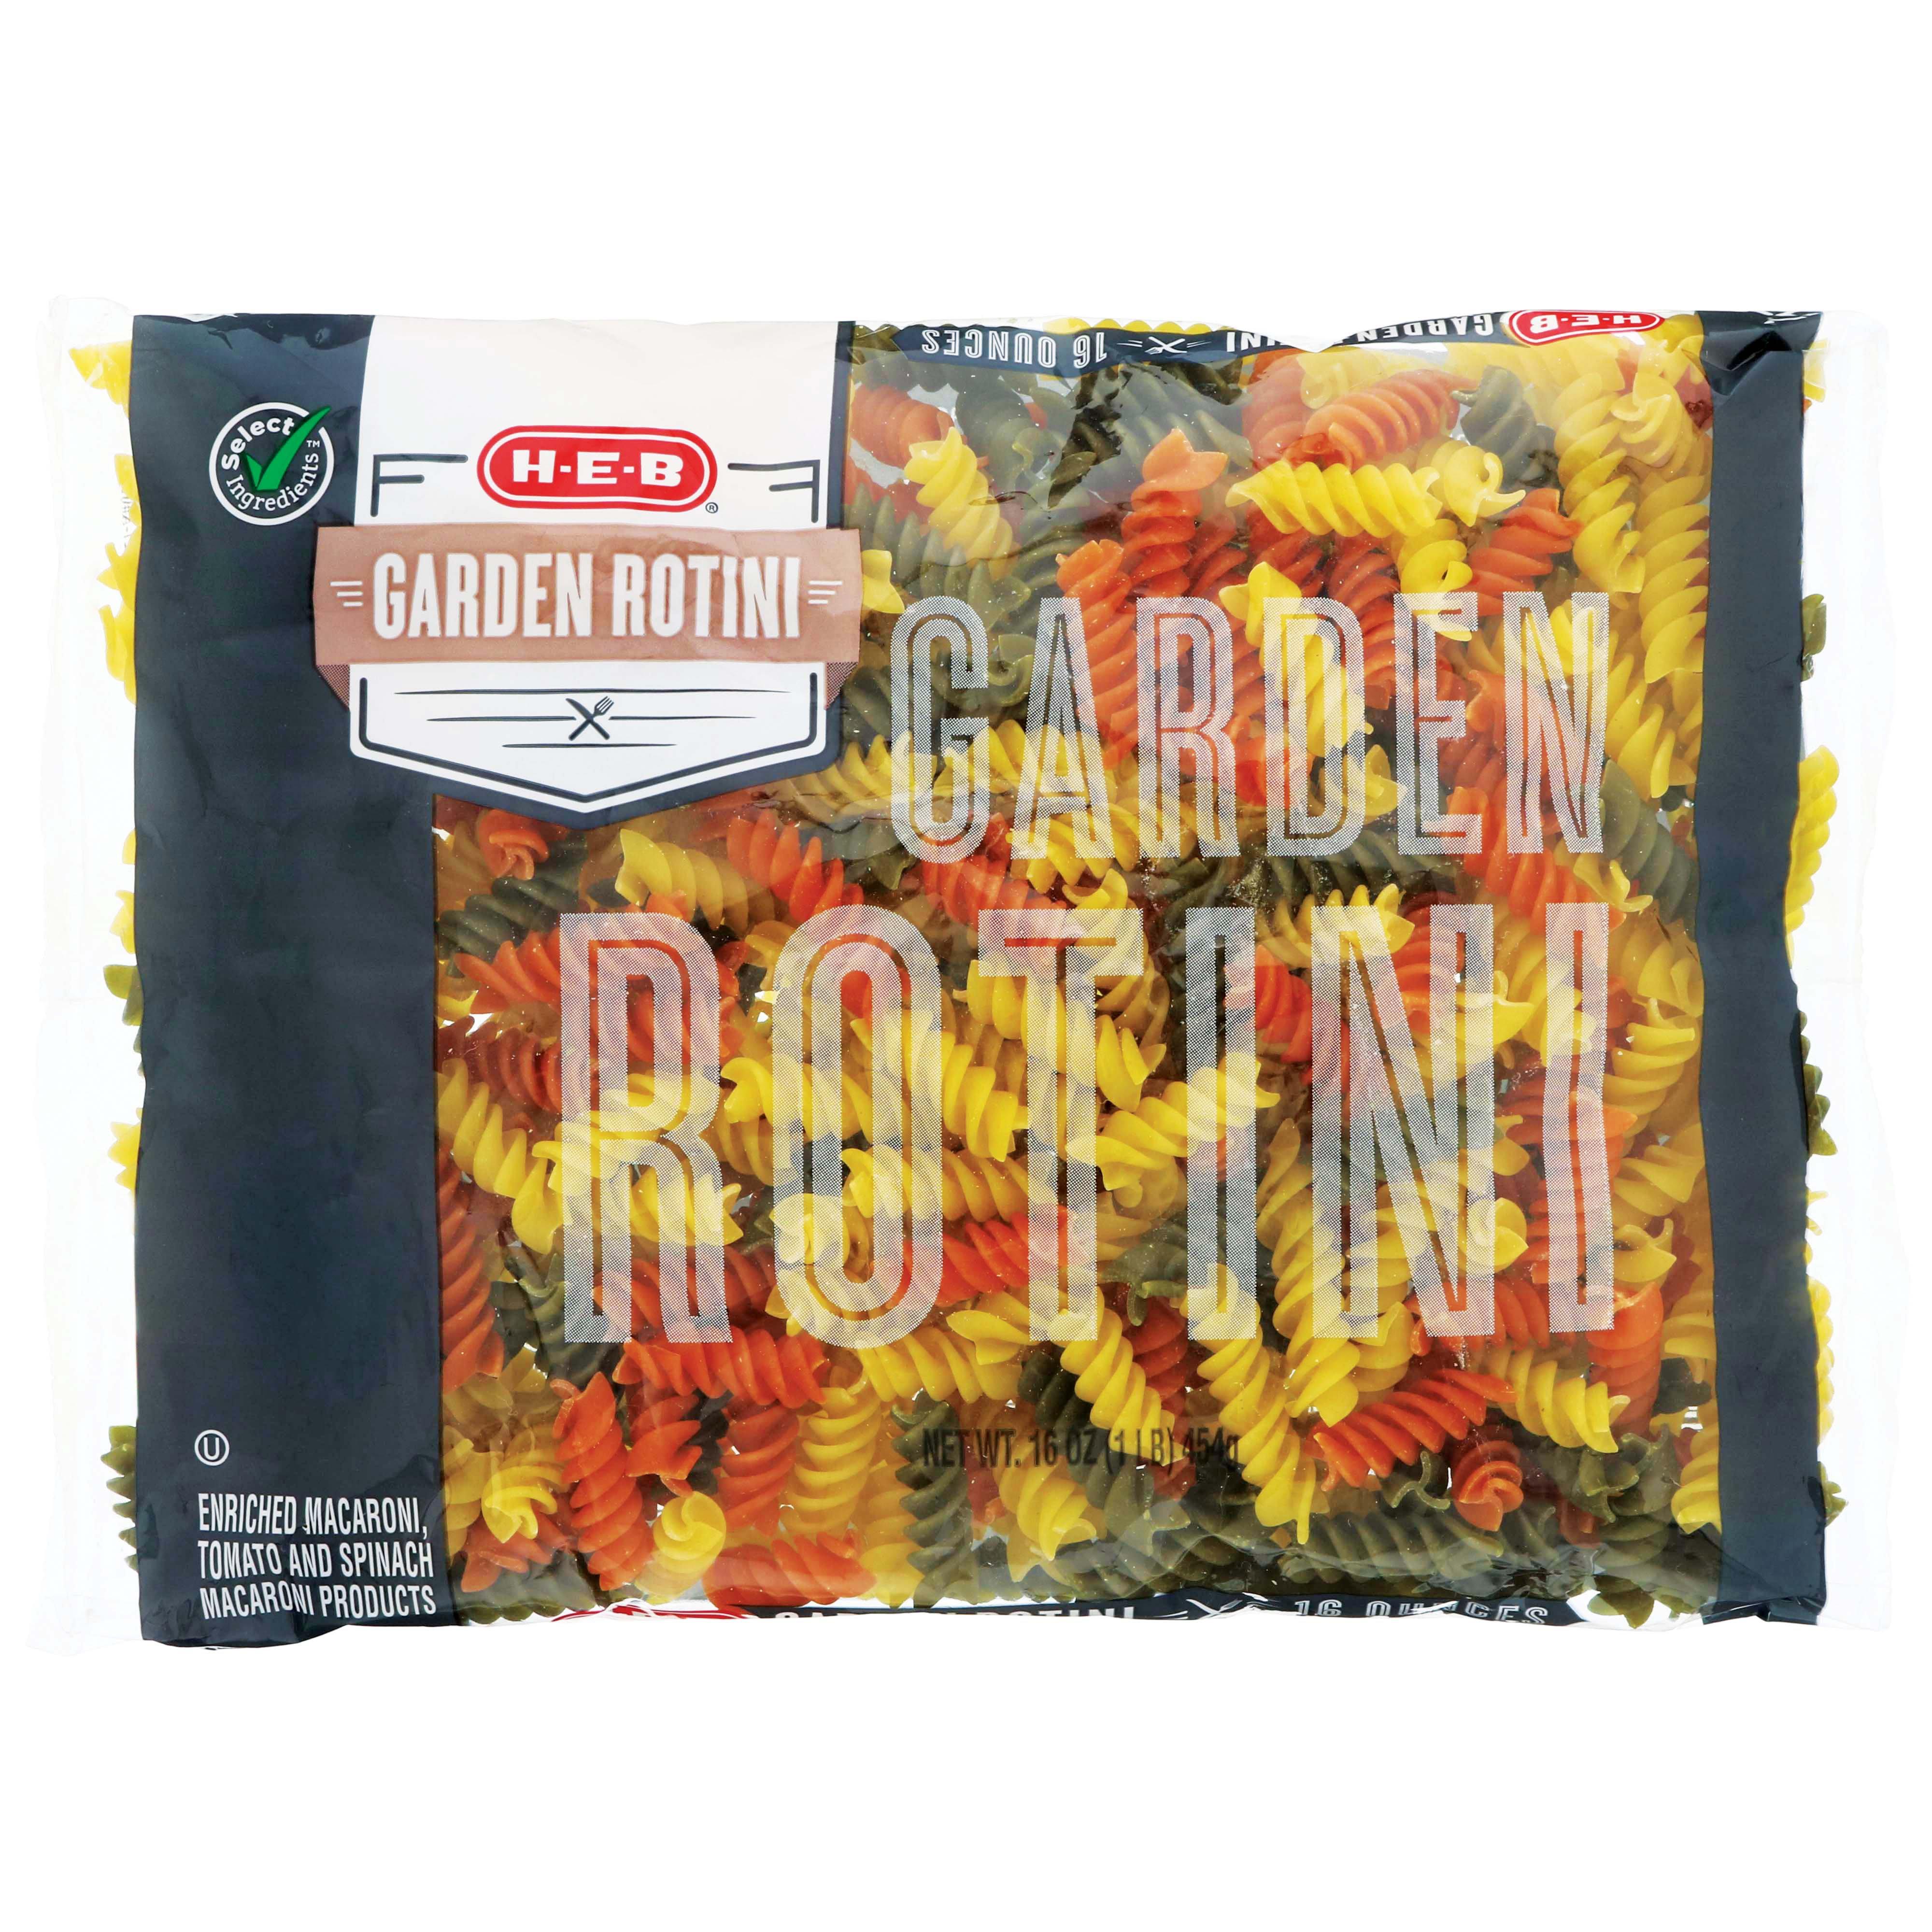 H‑E‑B Select Ingredients Garden Rotini ‑ Shop Pasta at HEB